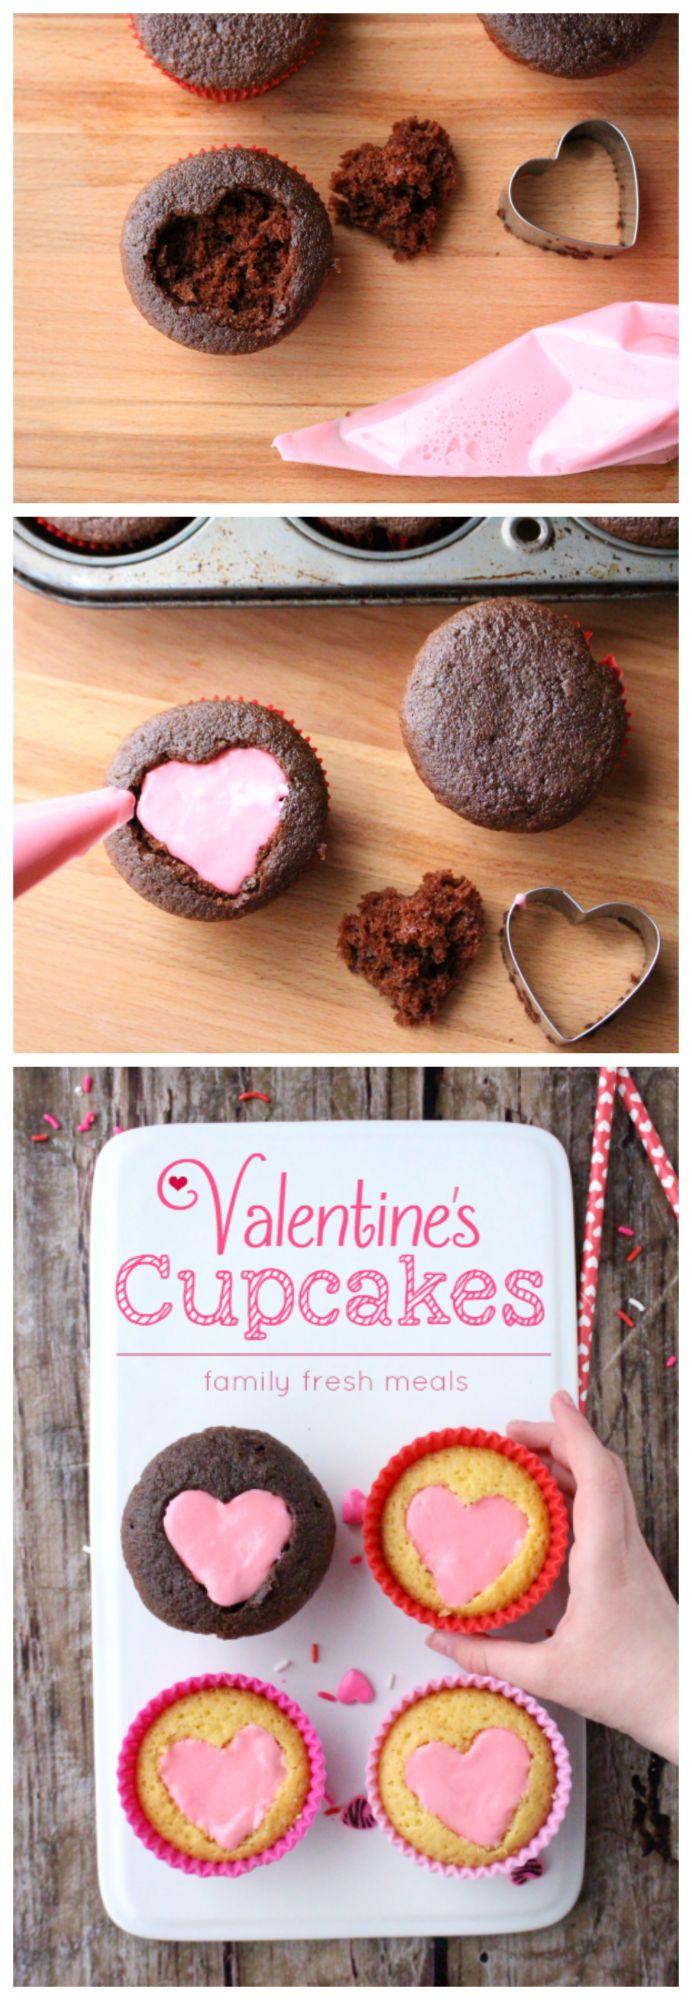 Easy Heart Valentine Cupcakes Recipe - Perfect for Valentine's Day! FamilyFreshMeals.com